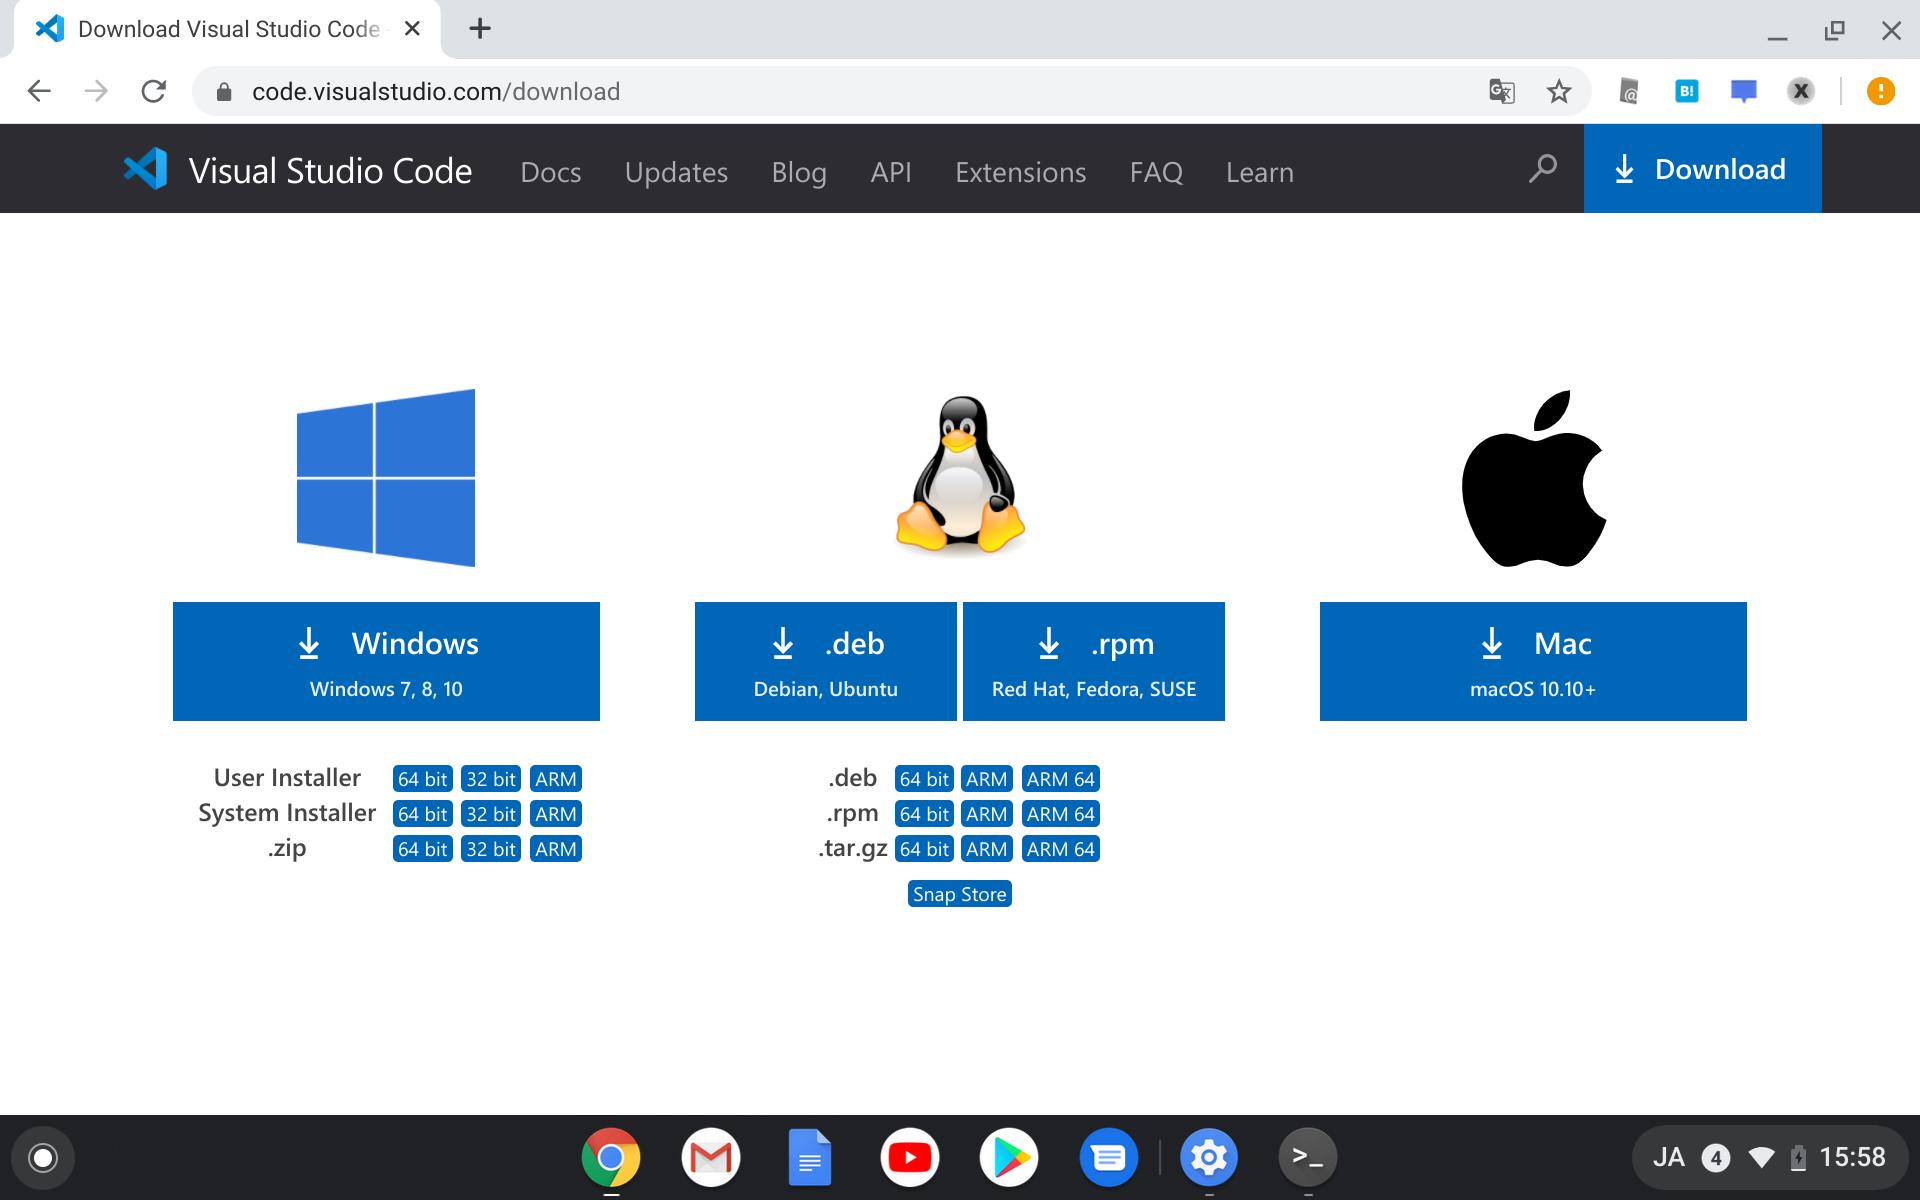 「Visual Studio Code」のダウンロードページ